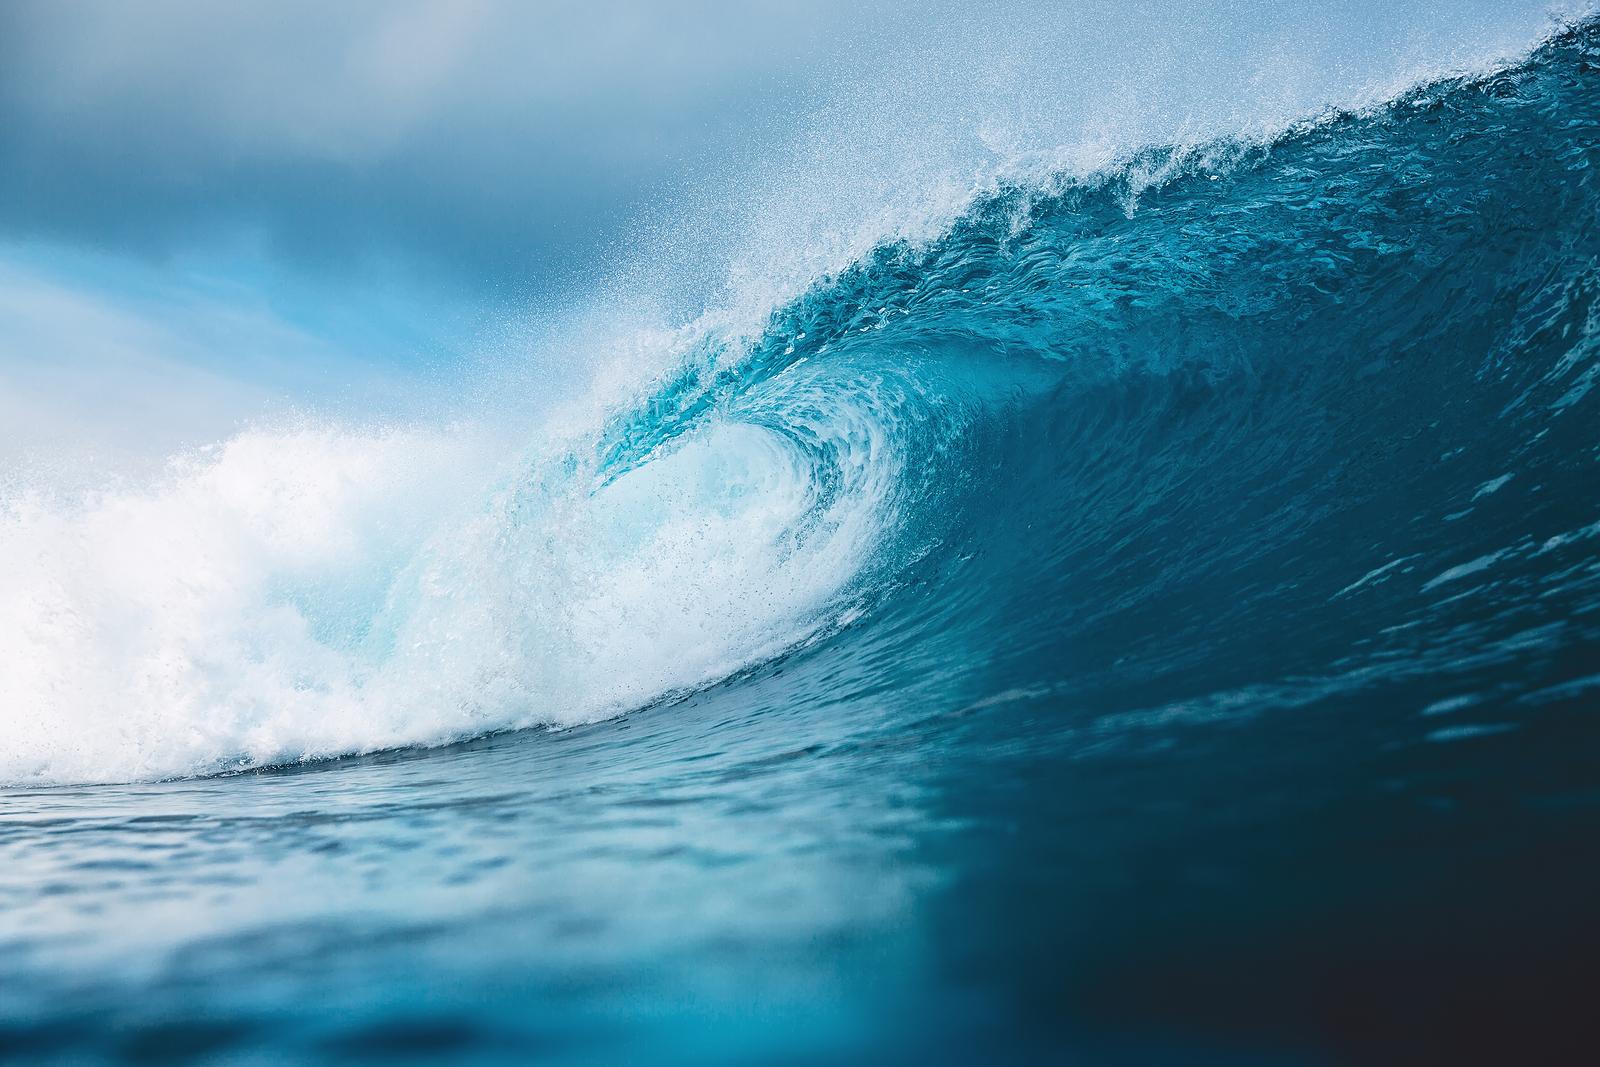 bigstock-ocean-blue-wave-in-ocean-brea-238151254-1.jpg